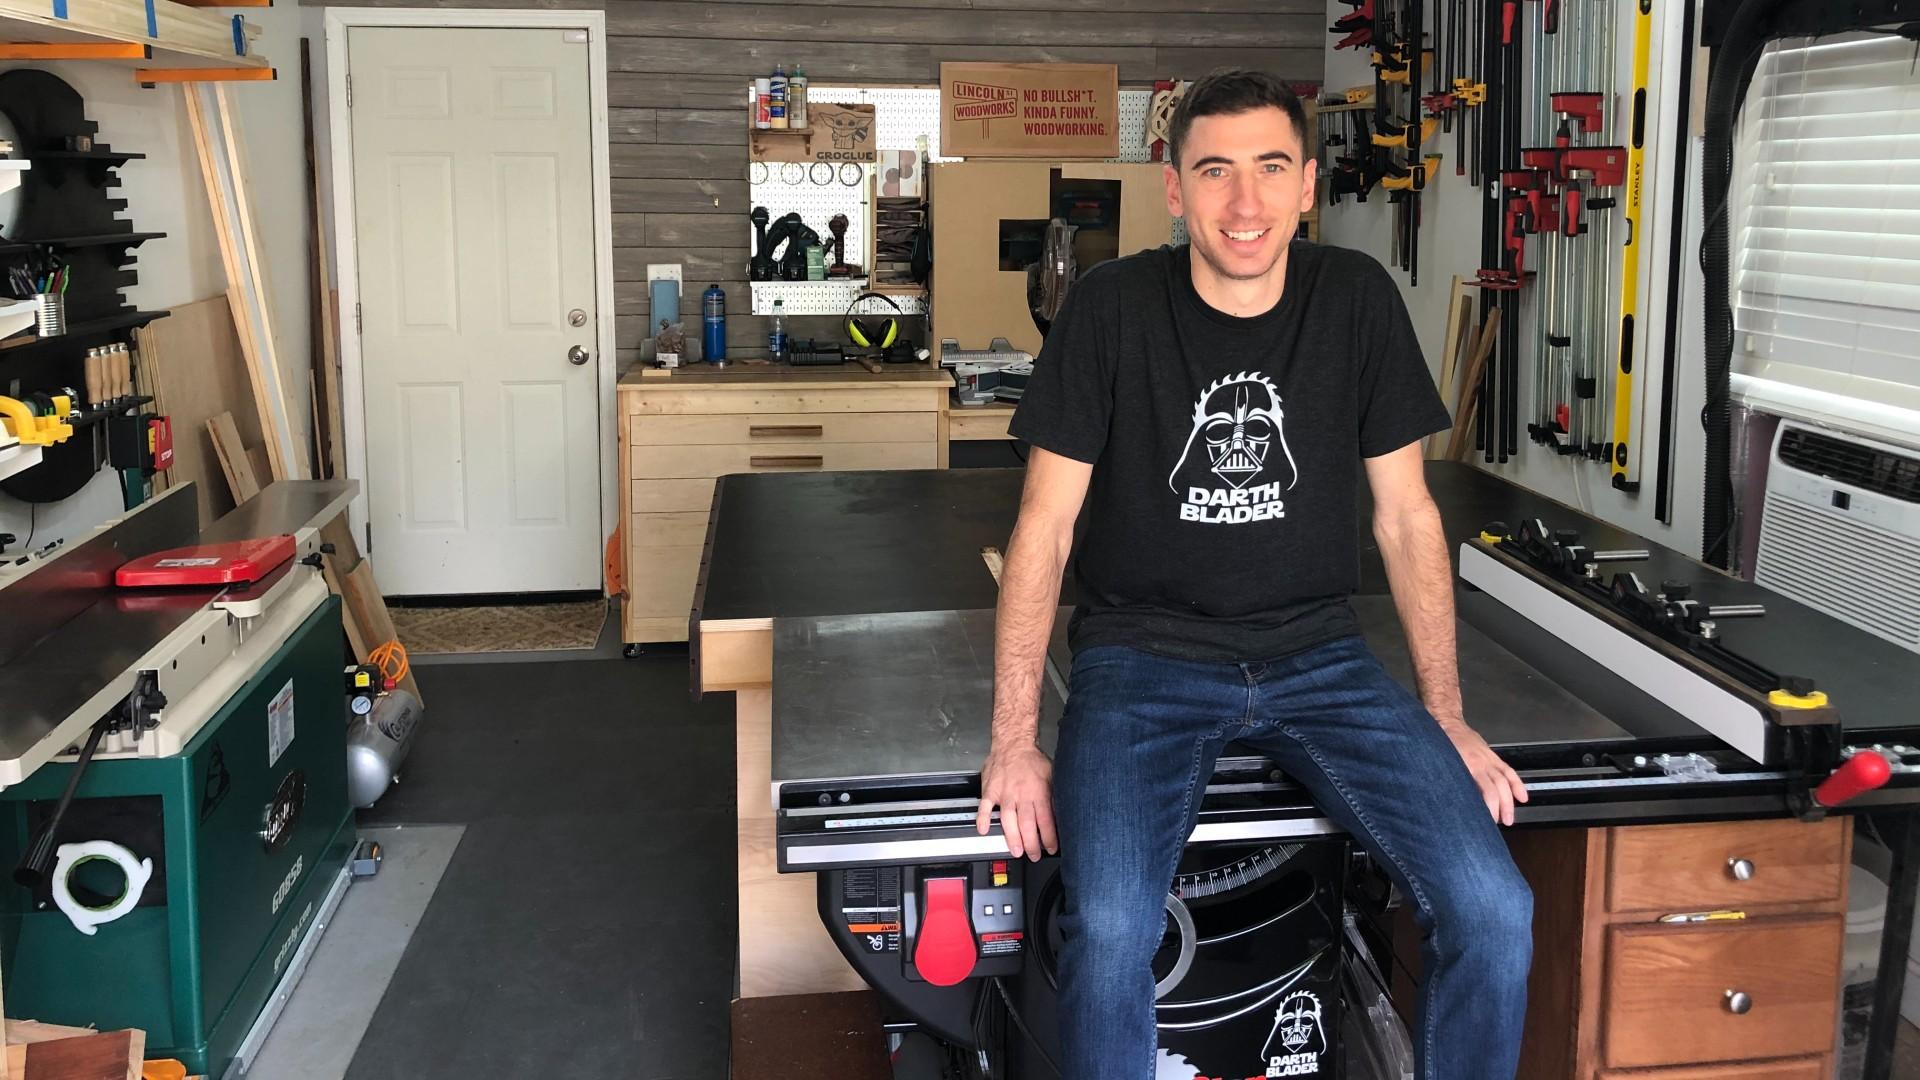 Woodworker Jon Cesaro